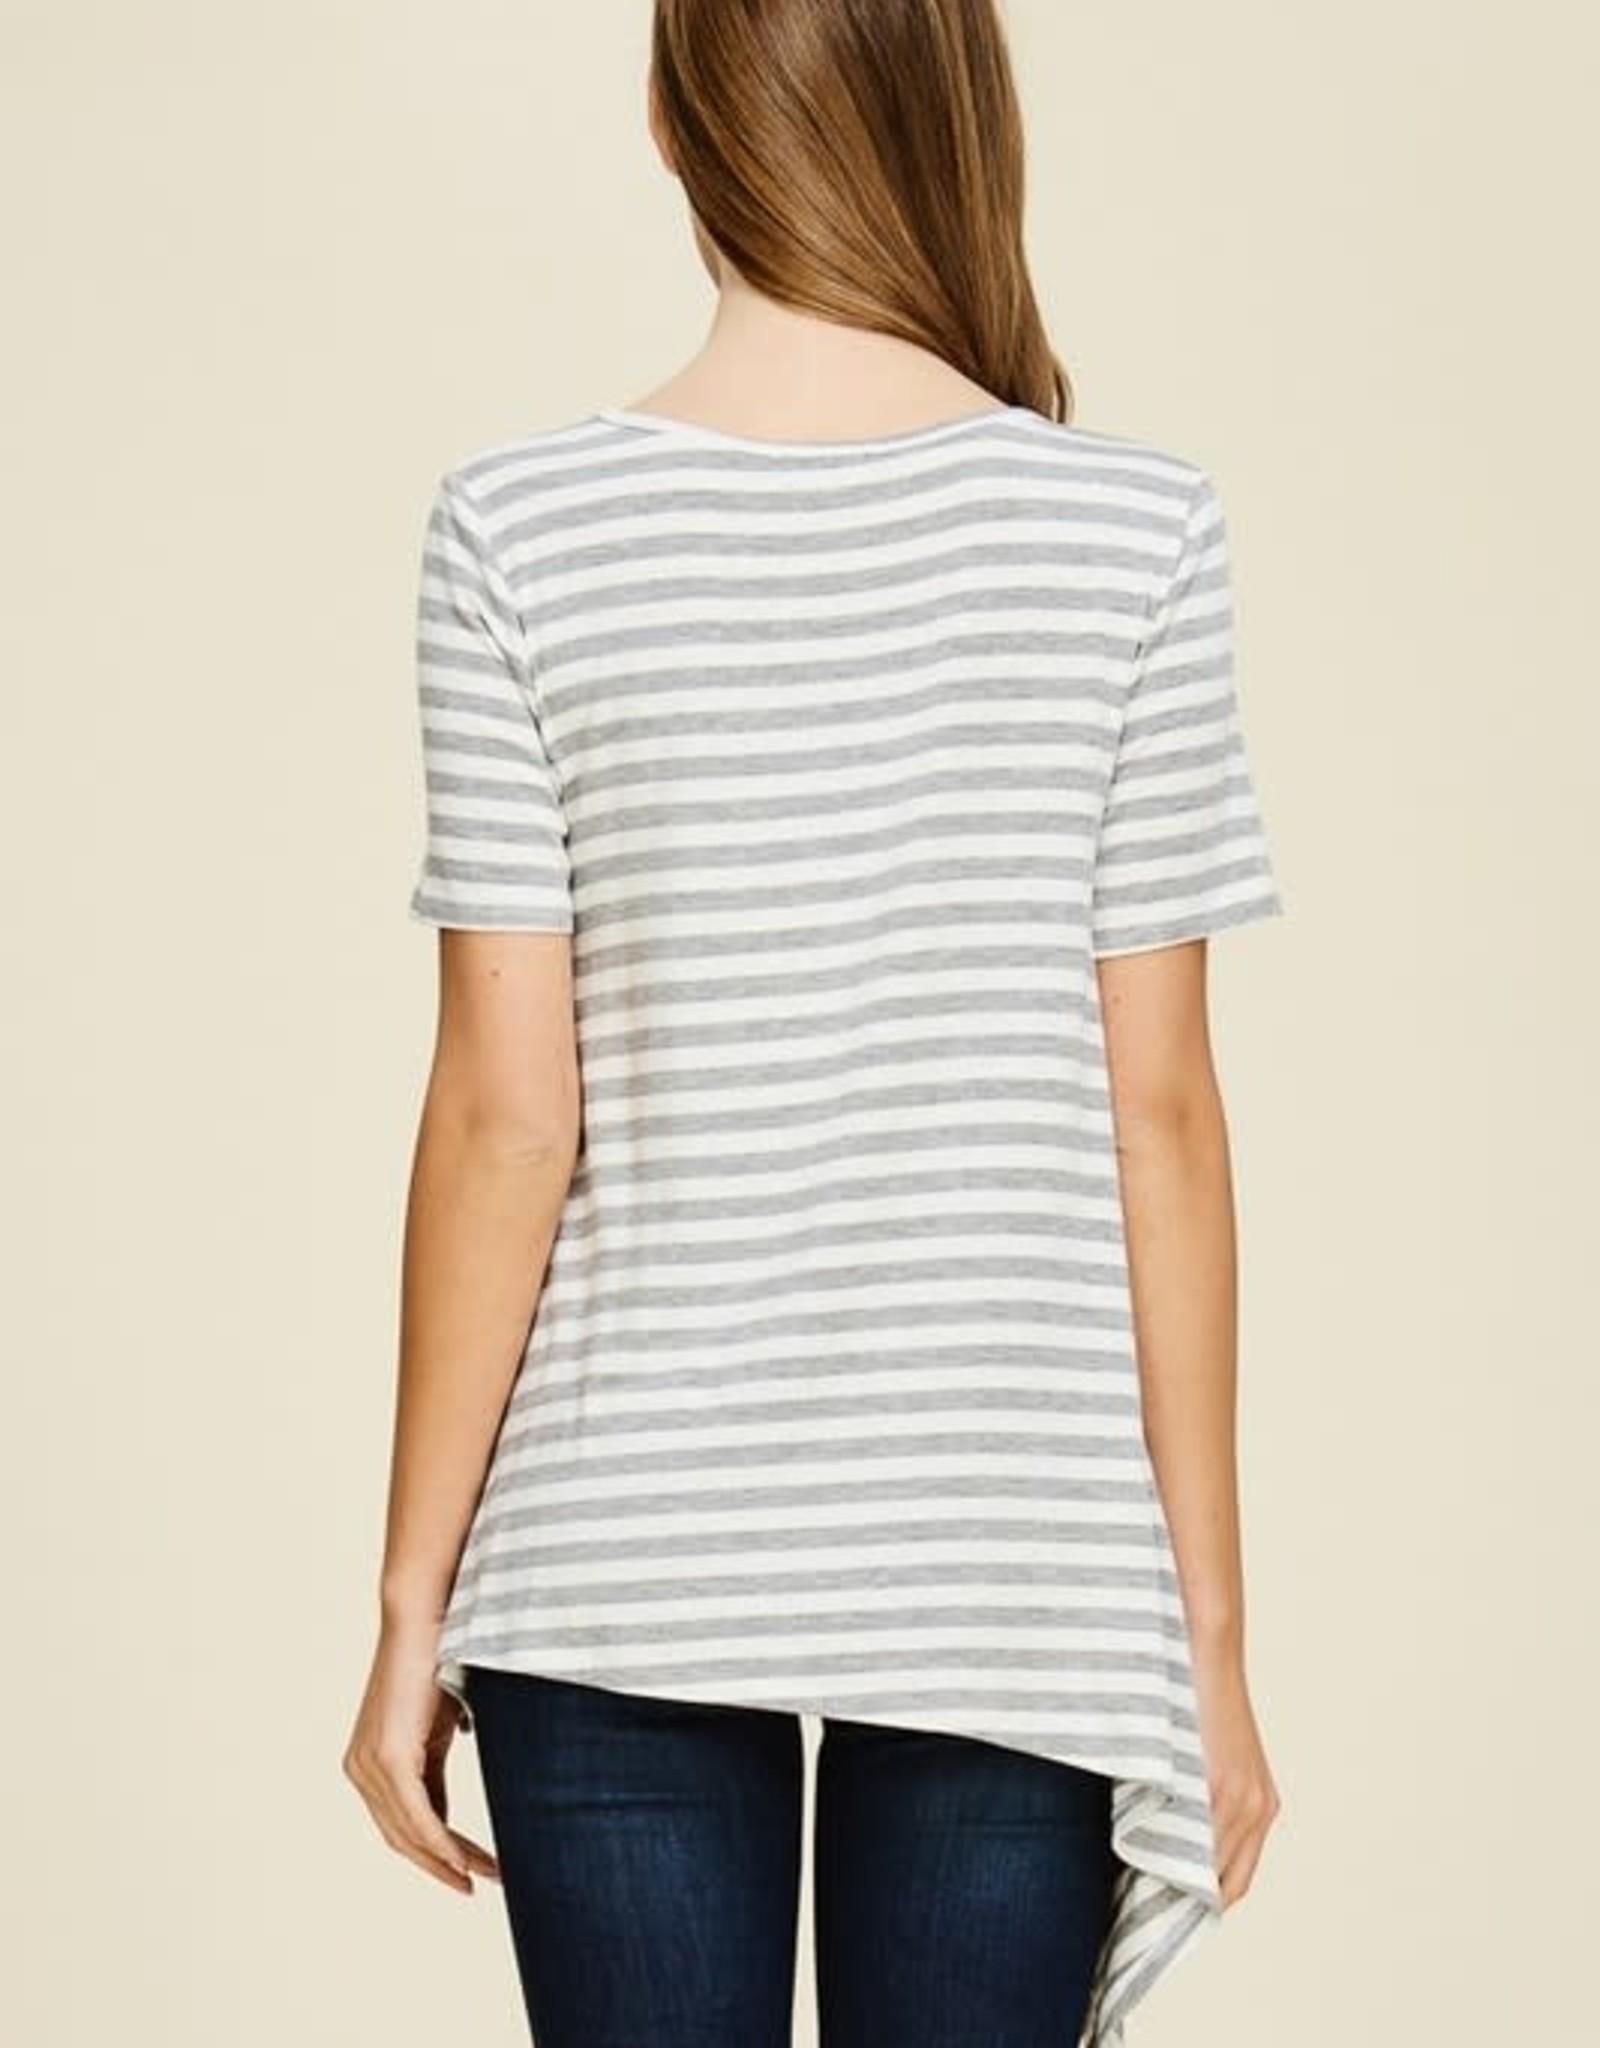 Ladies' Fashions Rayon Stripe S/S Top - Uneven Hem